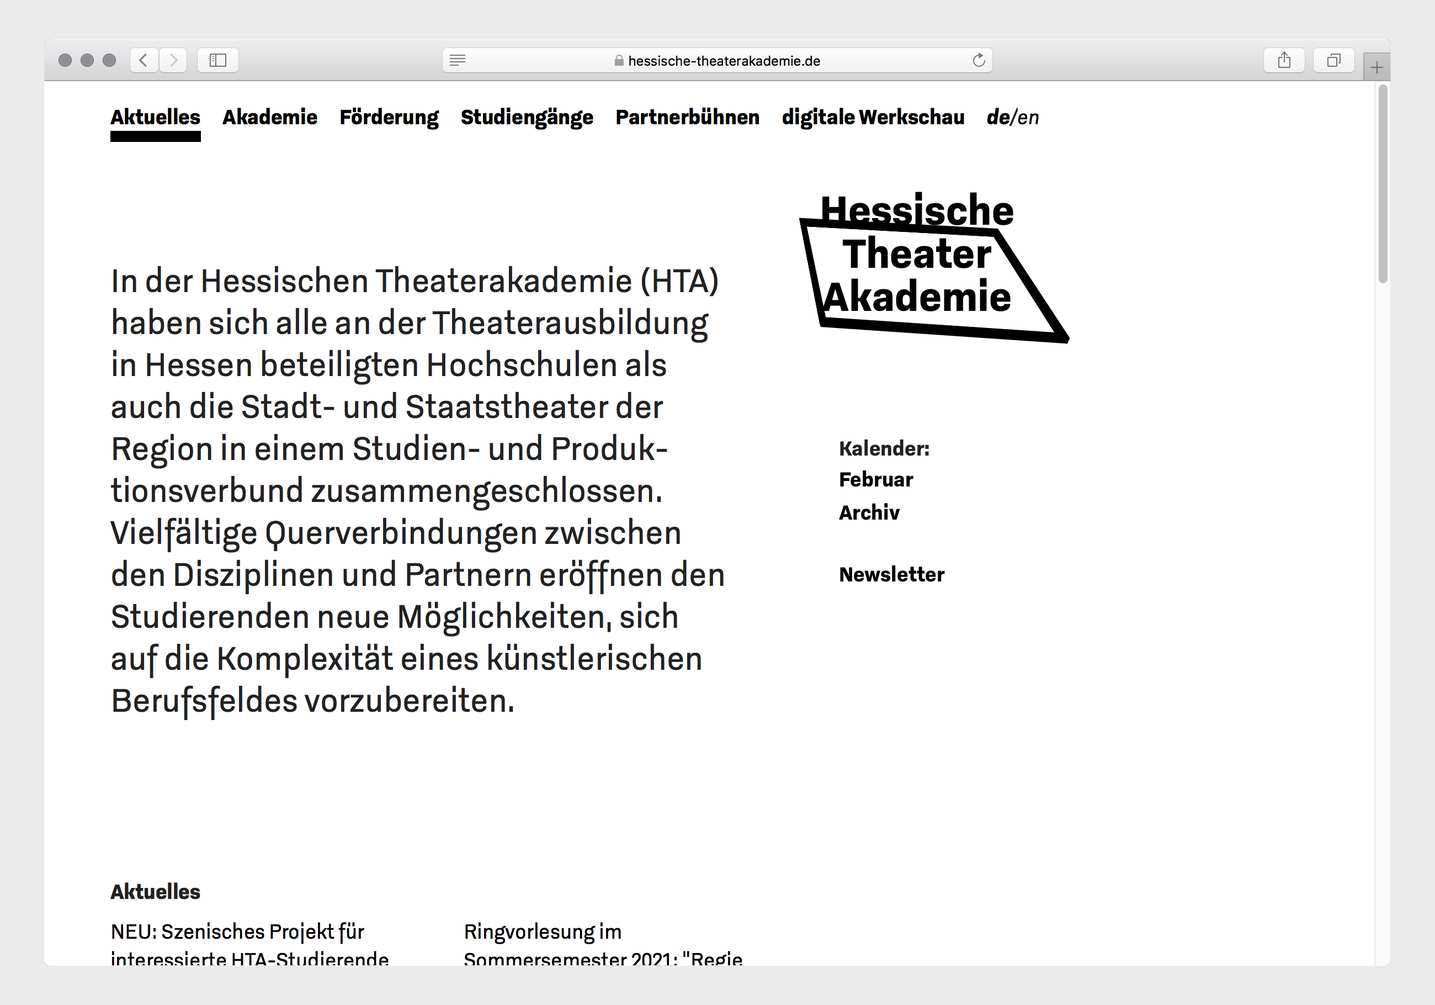 hta-website-1-1435x1004px